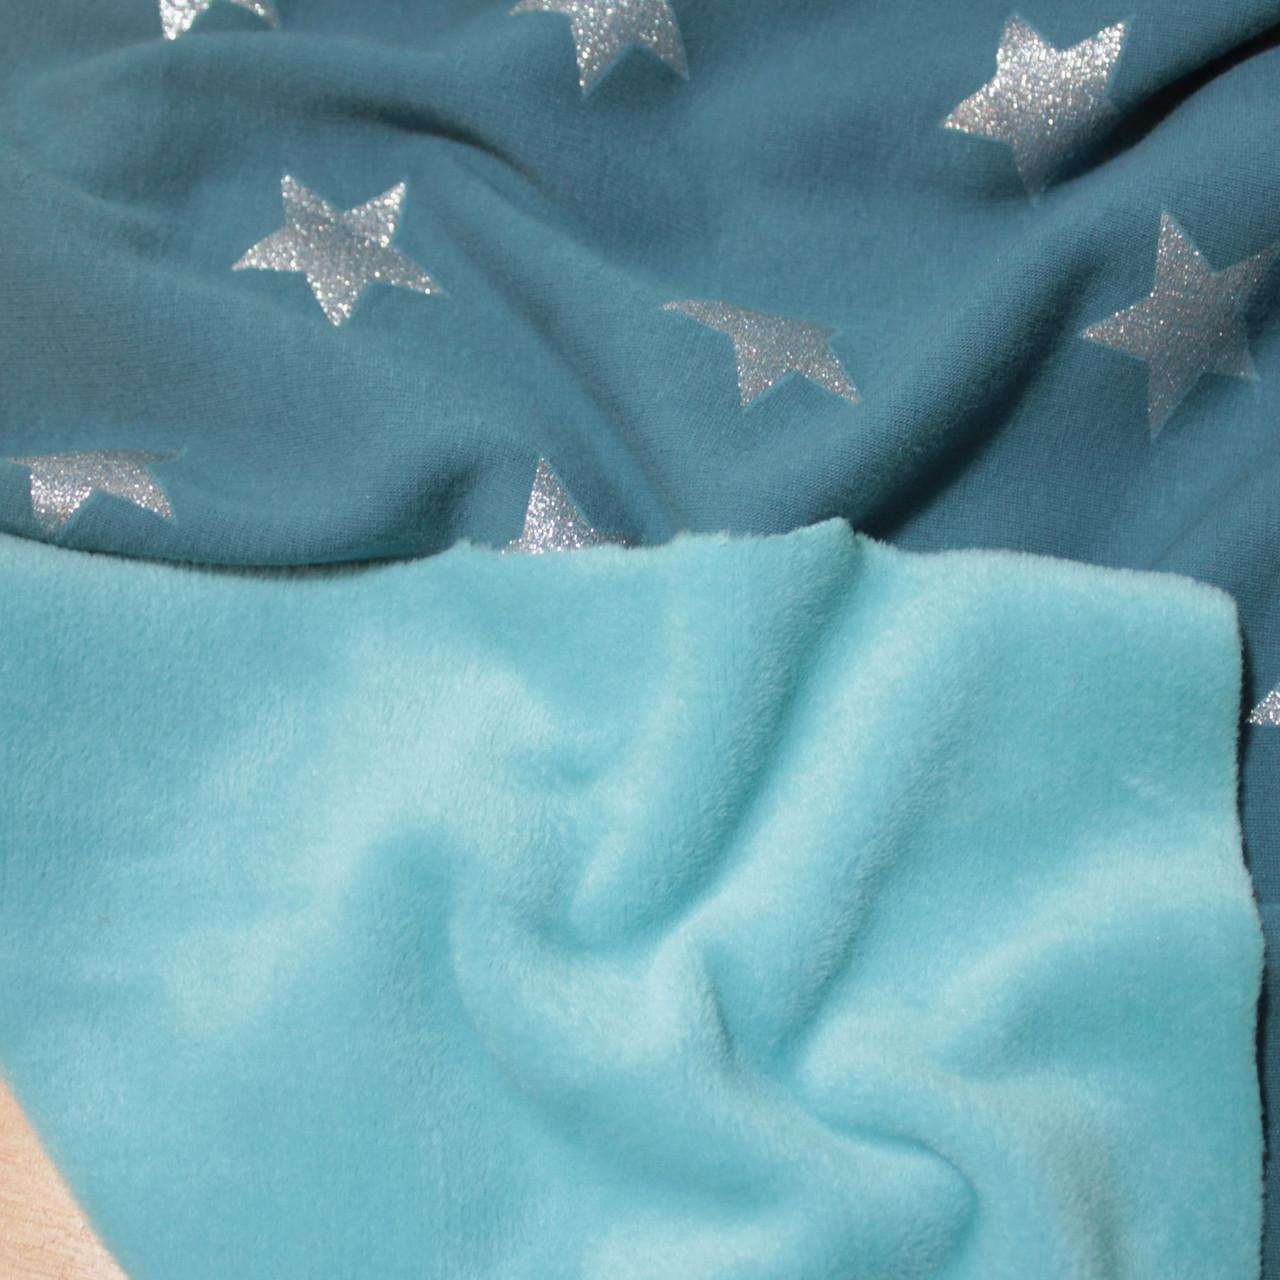 Трикотаж на меху принт звезды на голубом